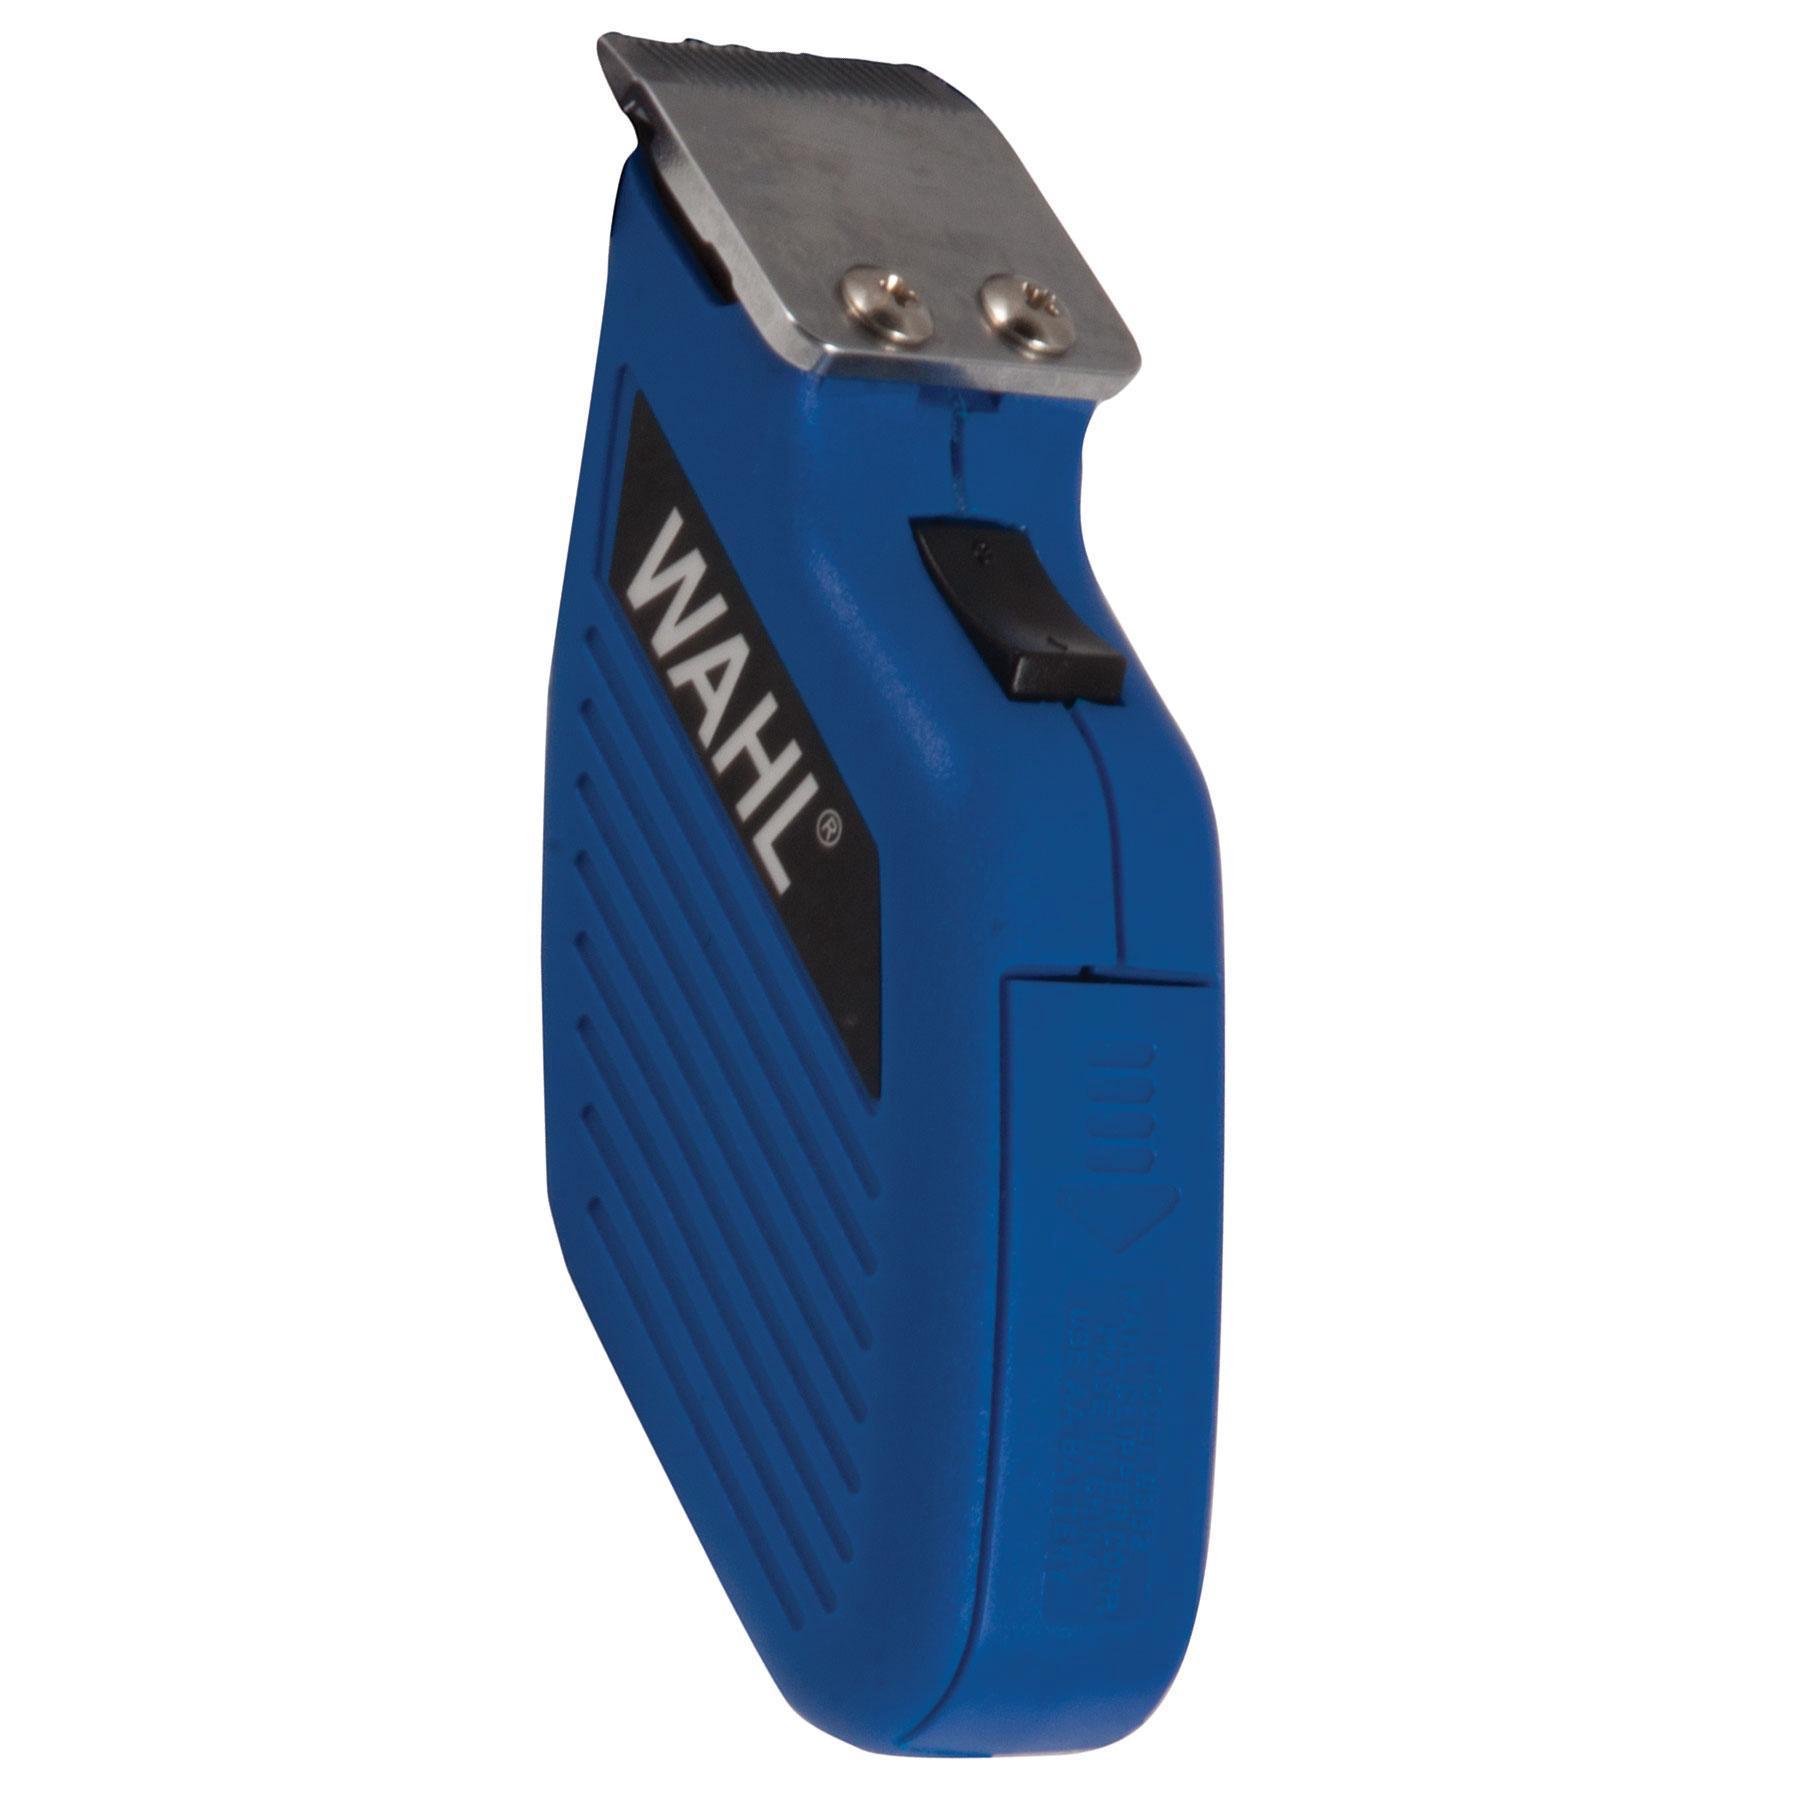 Wahl Pocket Pro Compact Trimmer